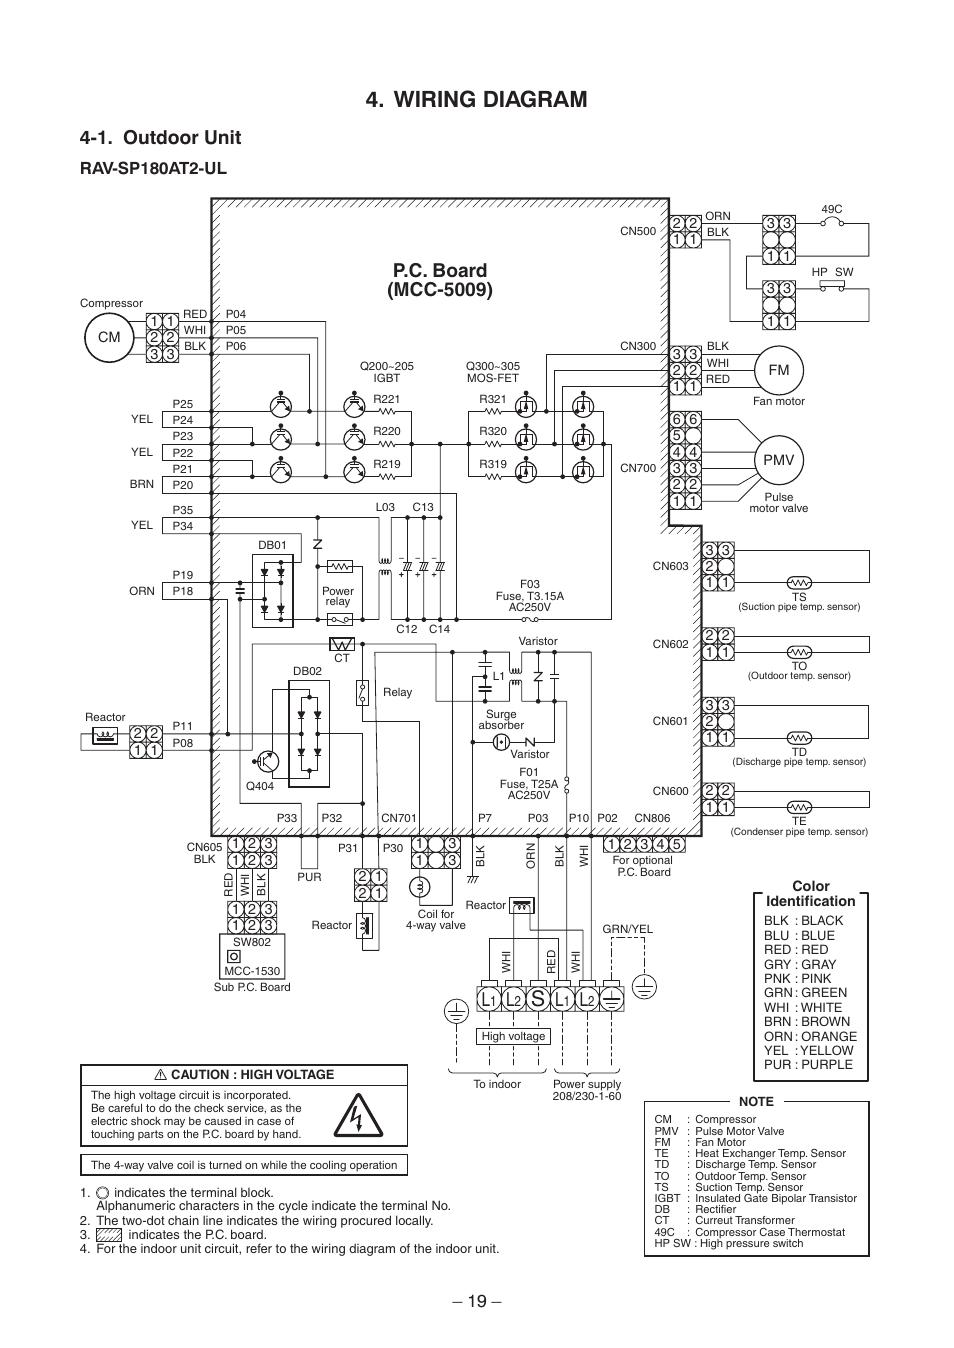 medium resolution of wiring diagram 1 outdoor unit p c board mcc 5009